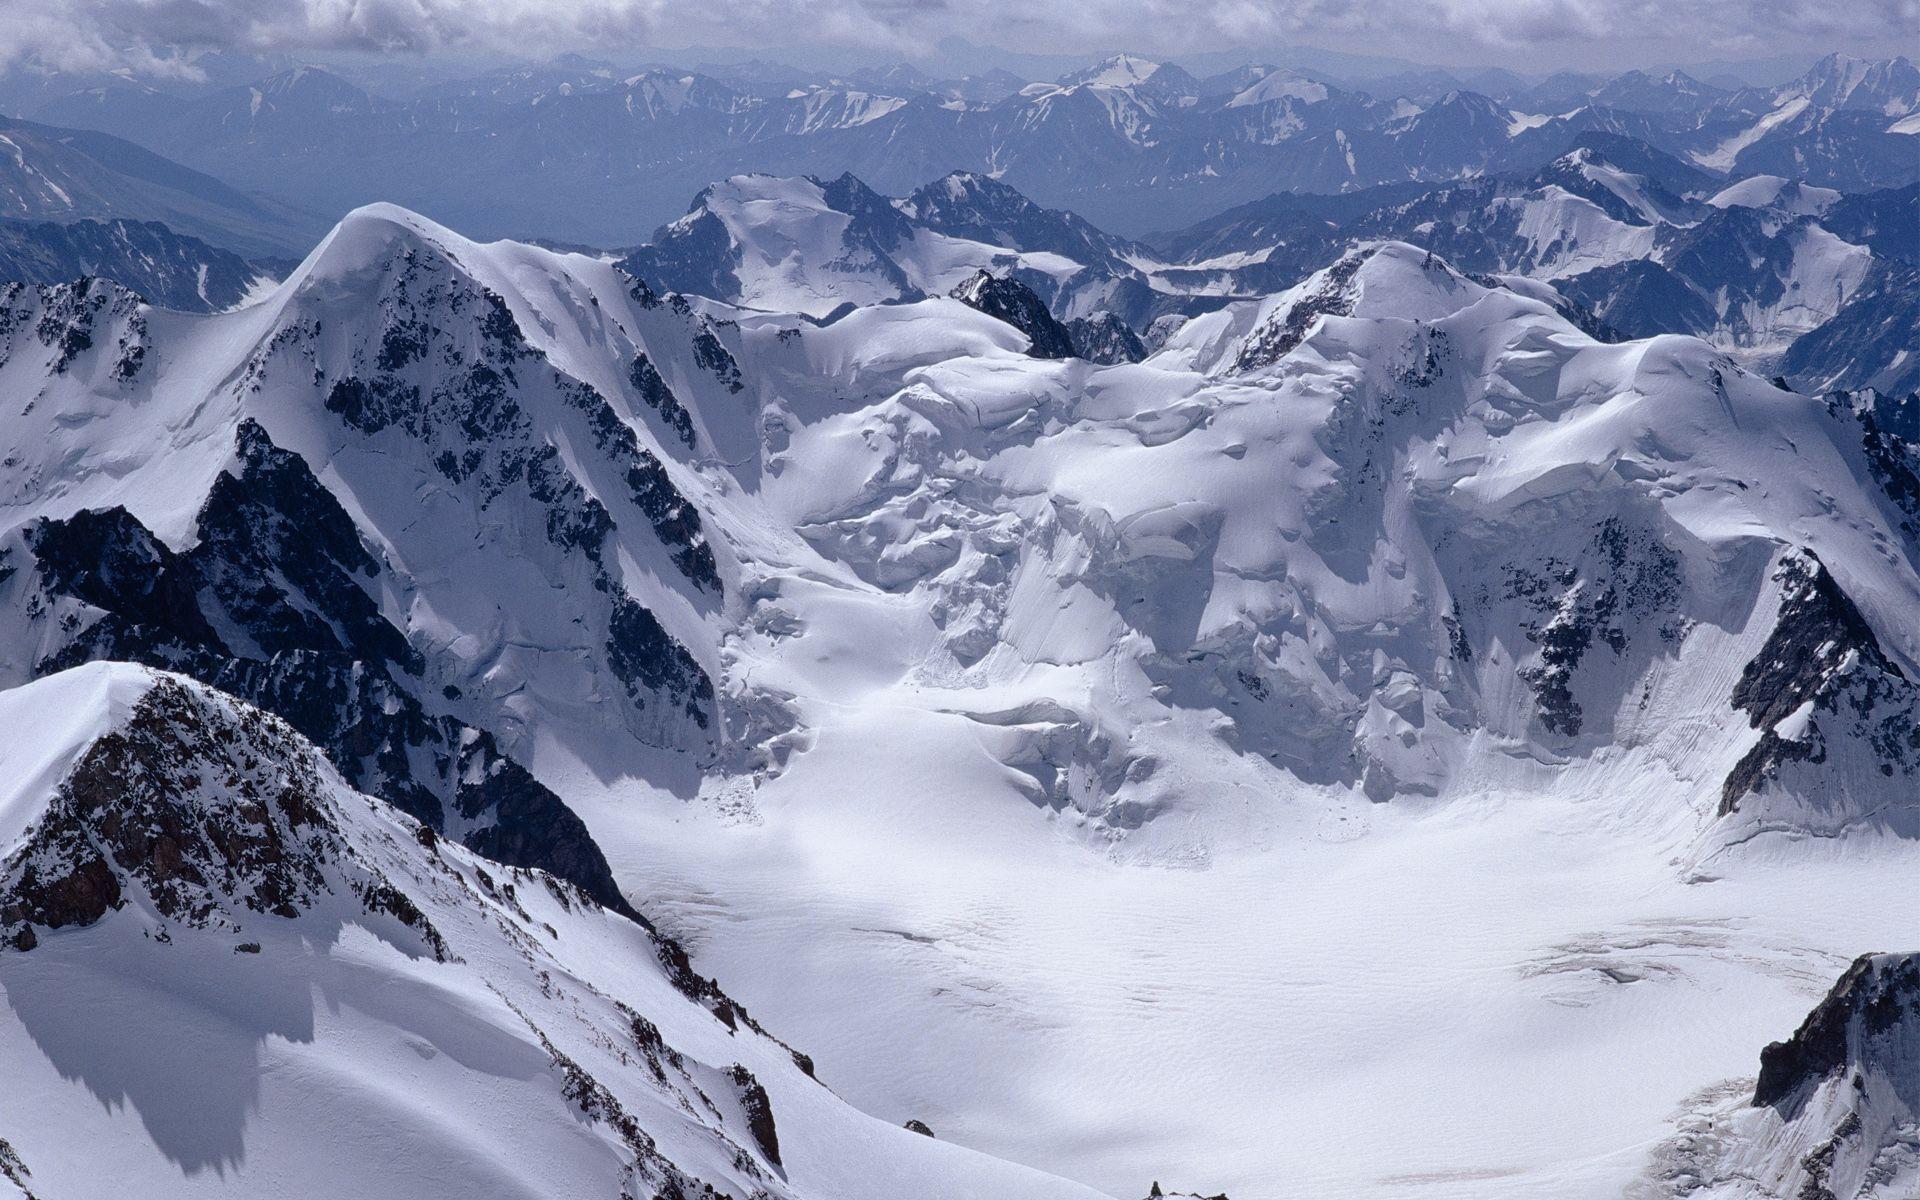 Snowy Mountains Wallpapers Wallpaper Mountain Wallpaper Mountain Landscape Winter Wallpaper Desktop